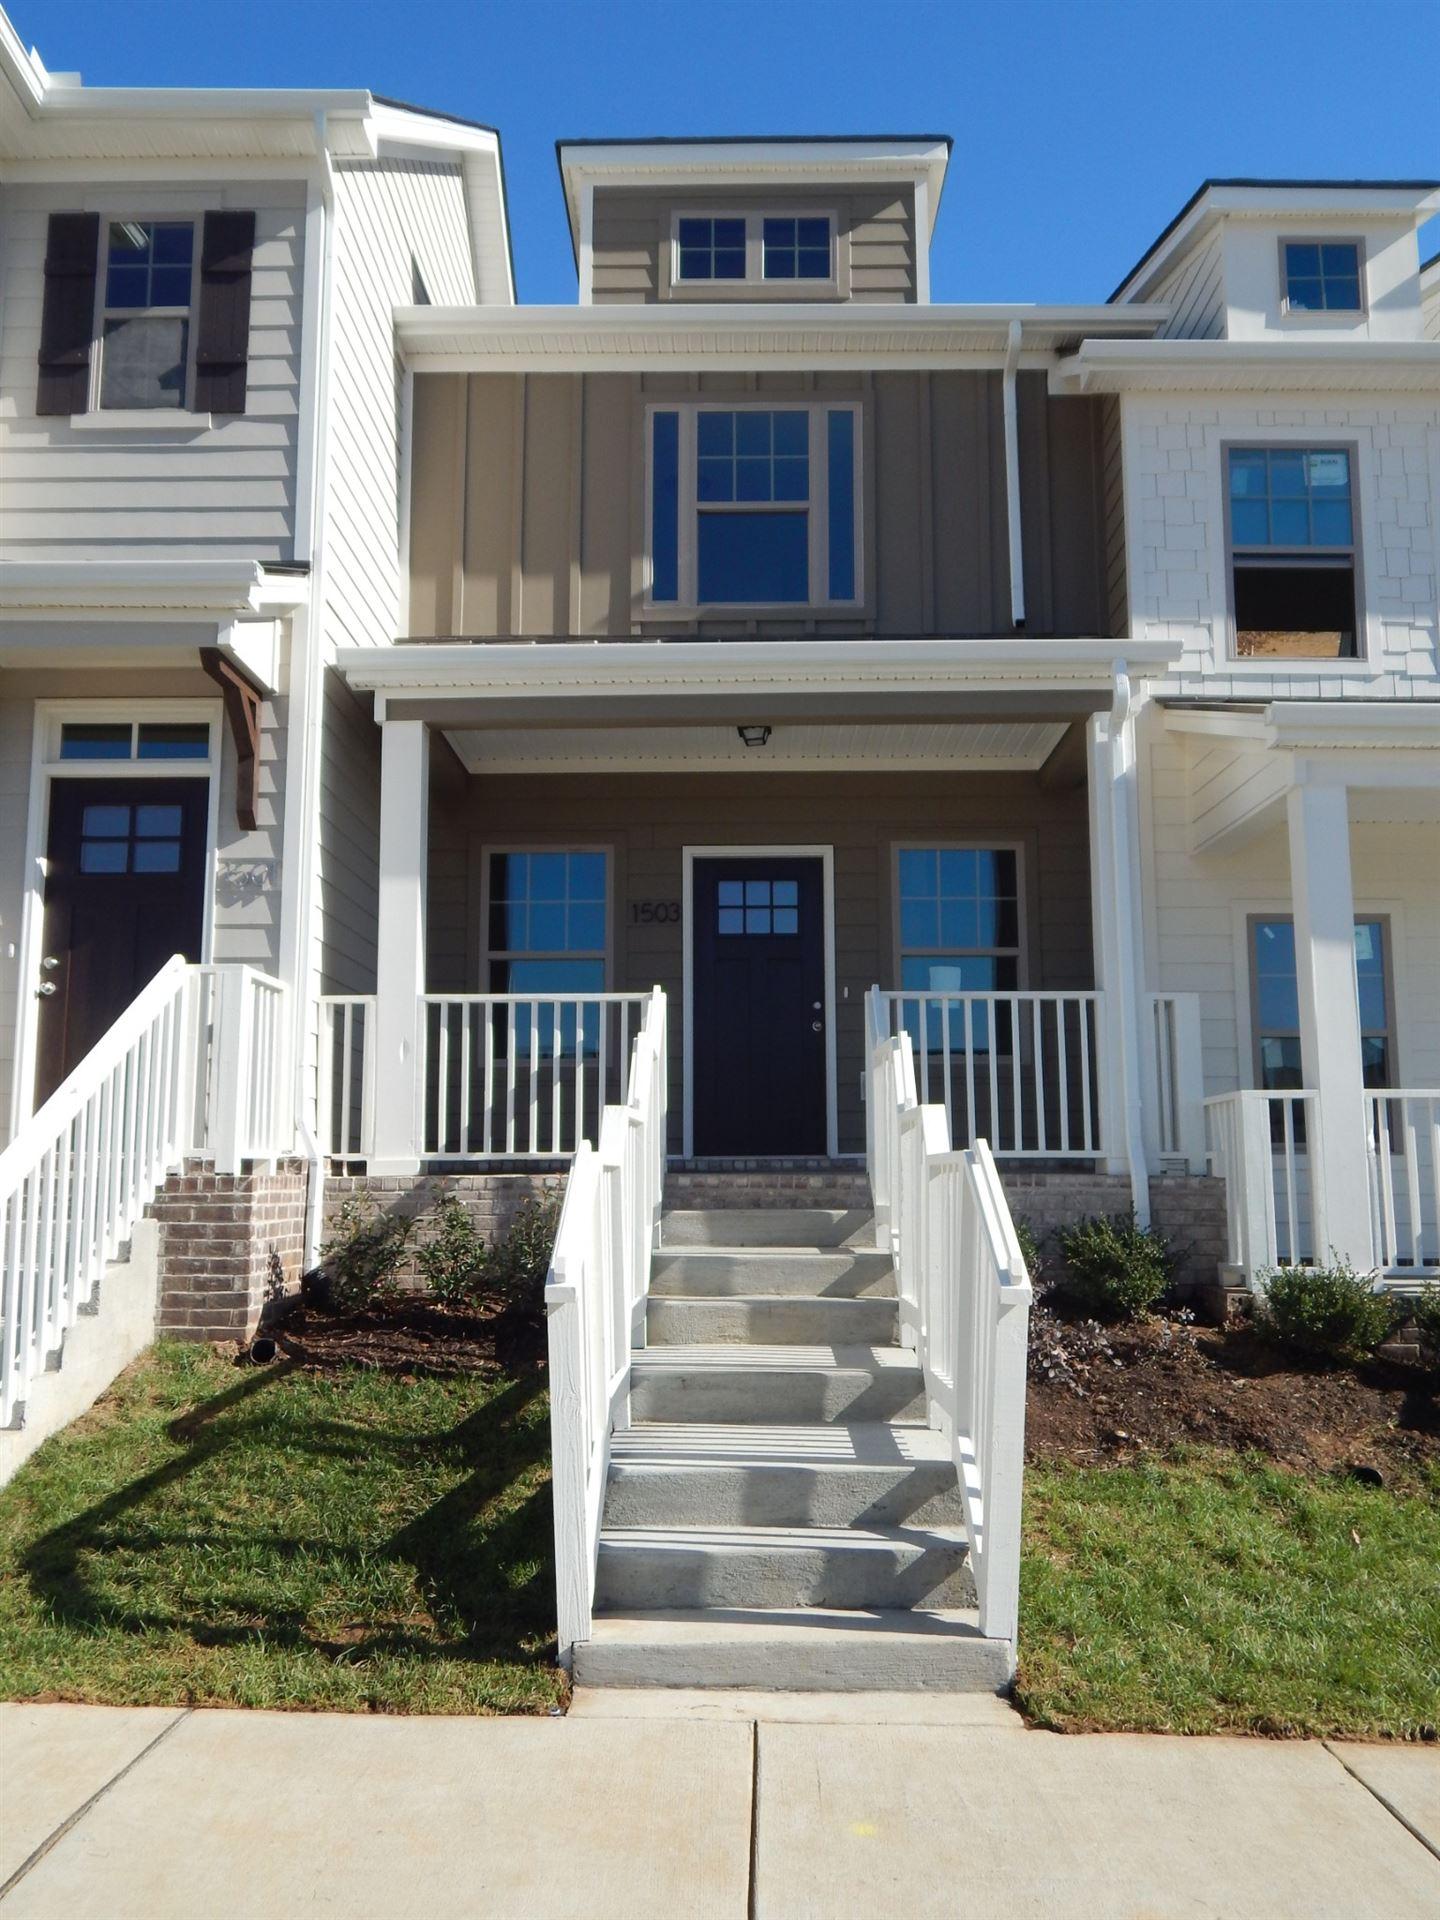 1503 White Tip Lane, Lot 24, Antioch, TN 37013 - MLS#: 2200503